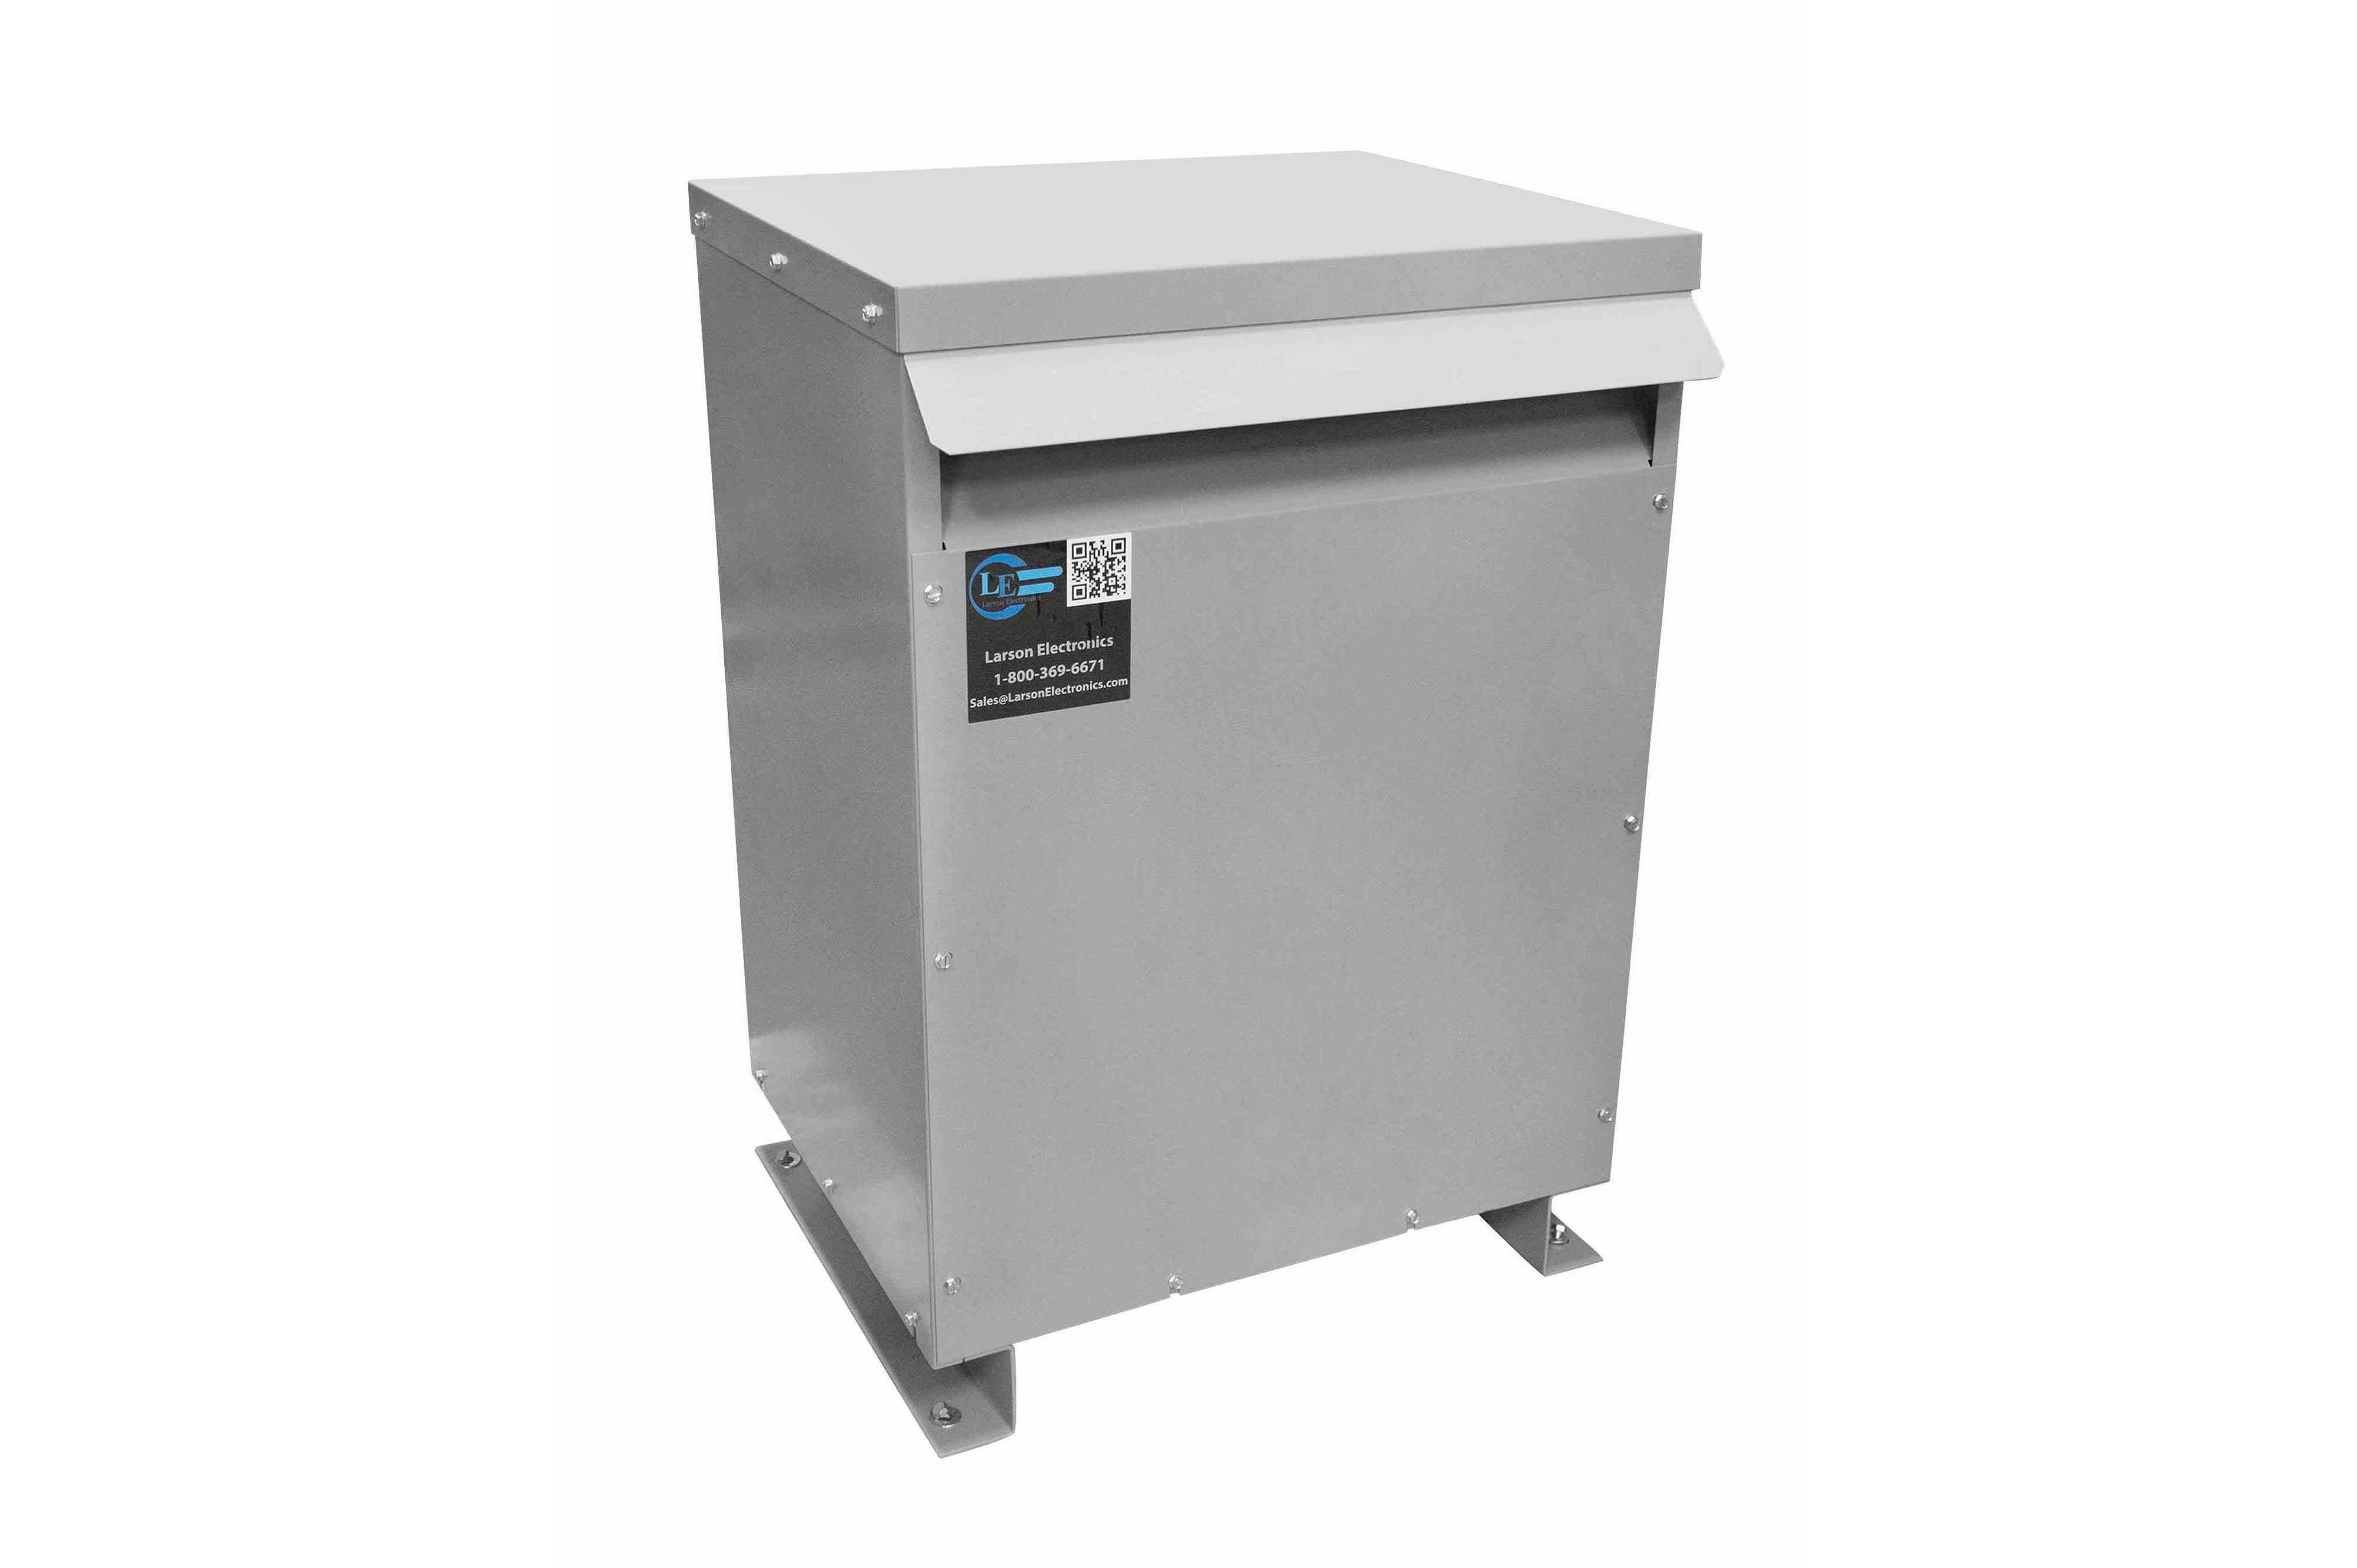 800 kVA 3PH Isolation Transformer, 240V Wye Primary, 380Y/220 Wye-N Secondary, N3R, Ventilated, 60 Hz